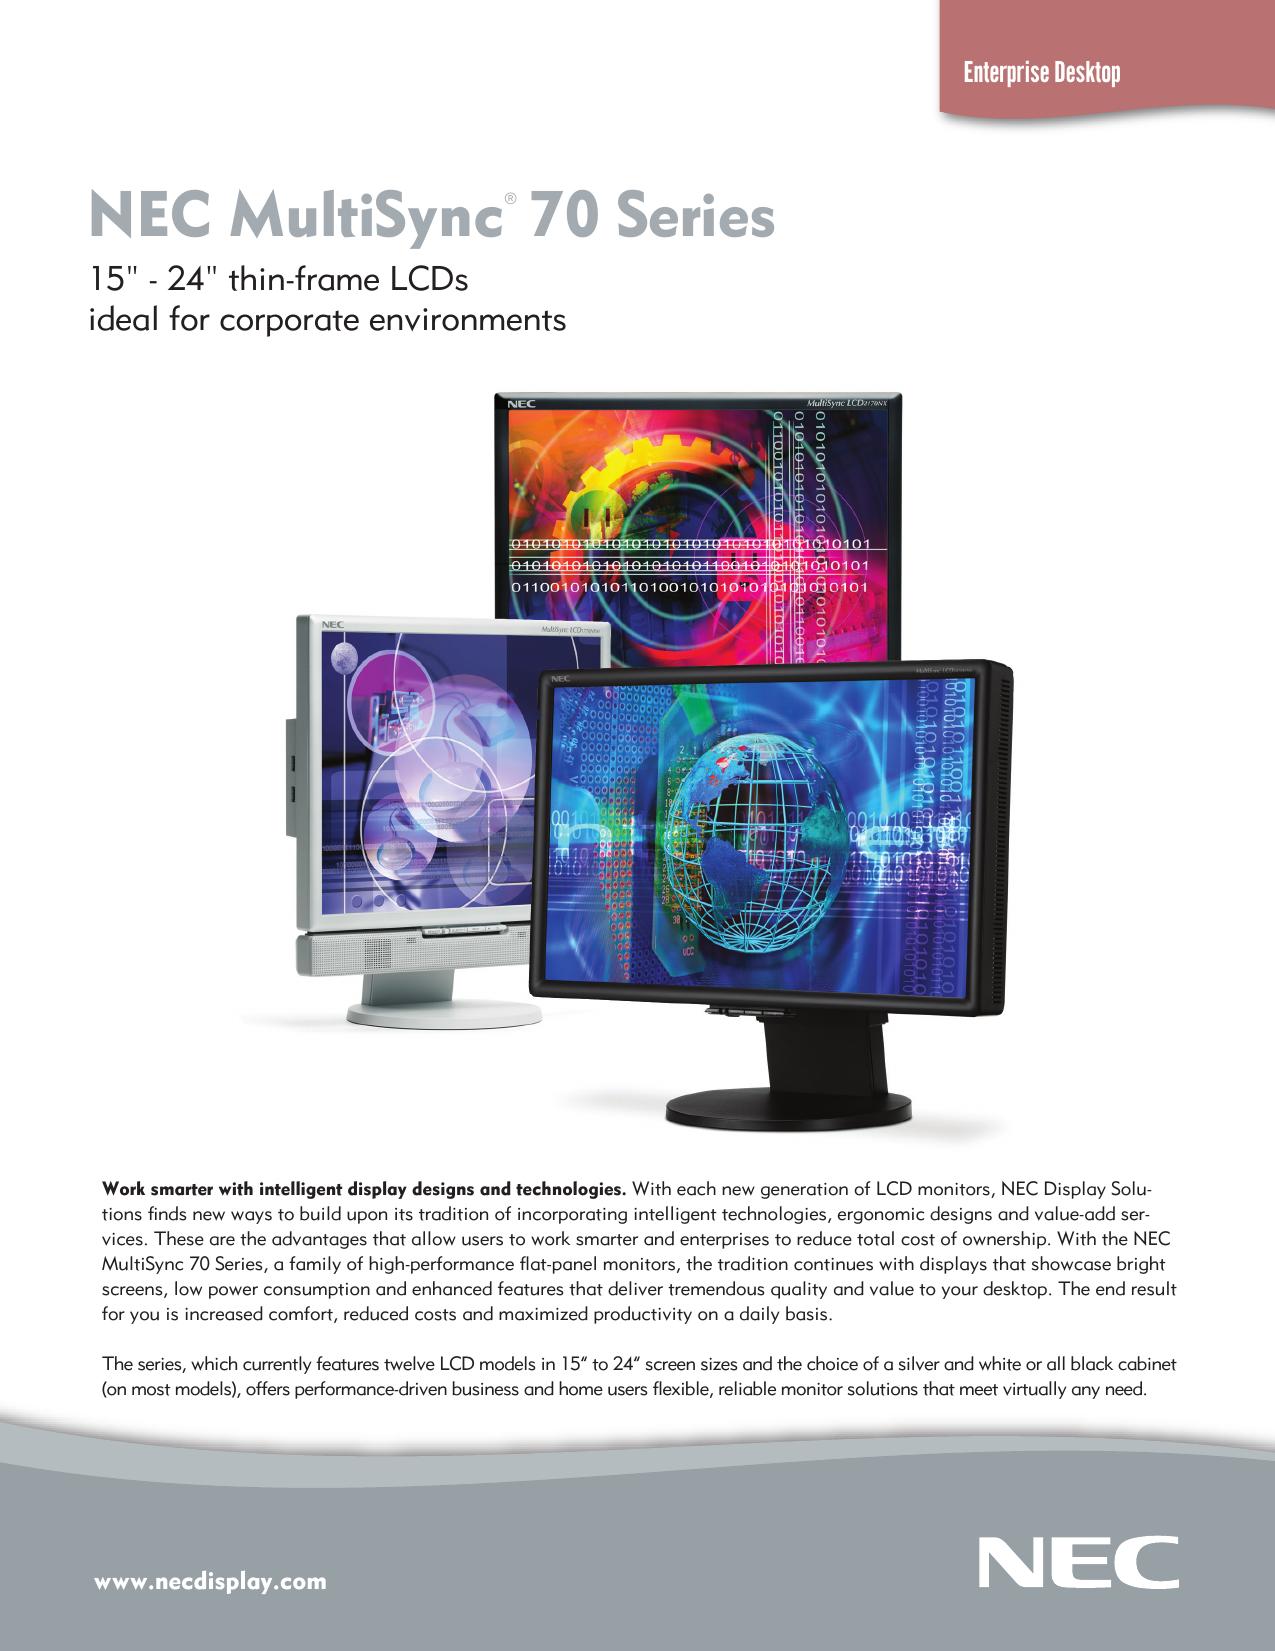 NEC MULTISYNC LCD2070NX DRIVER WINDOWS XP